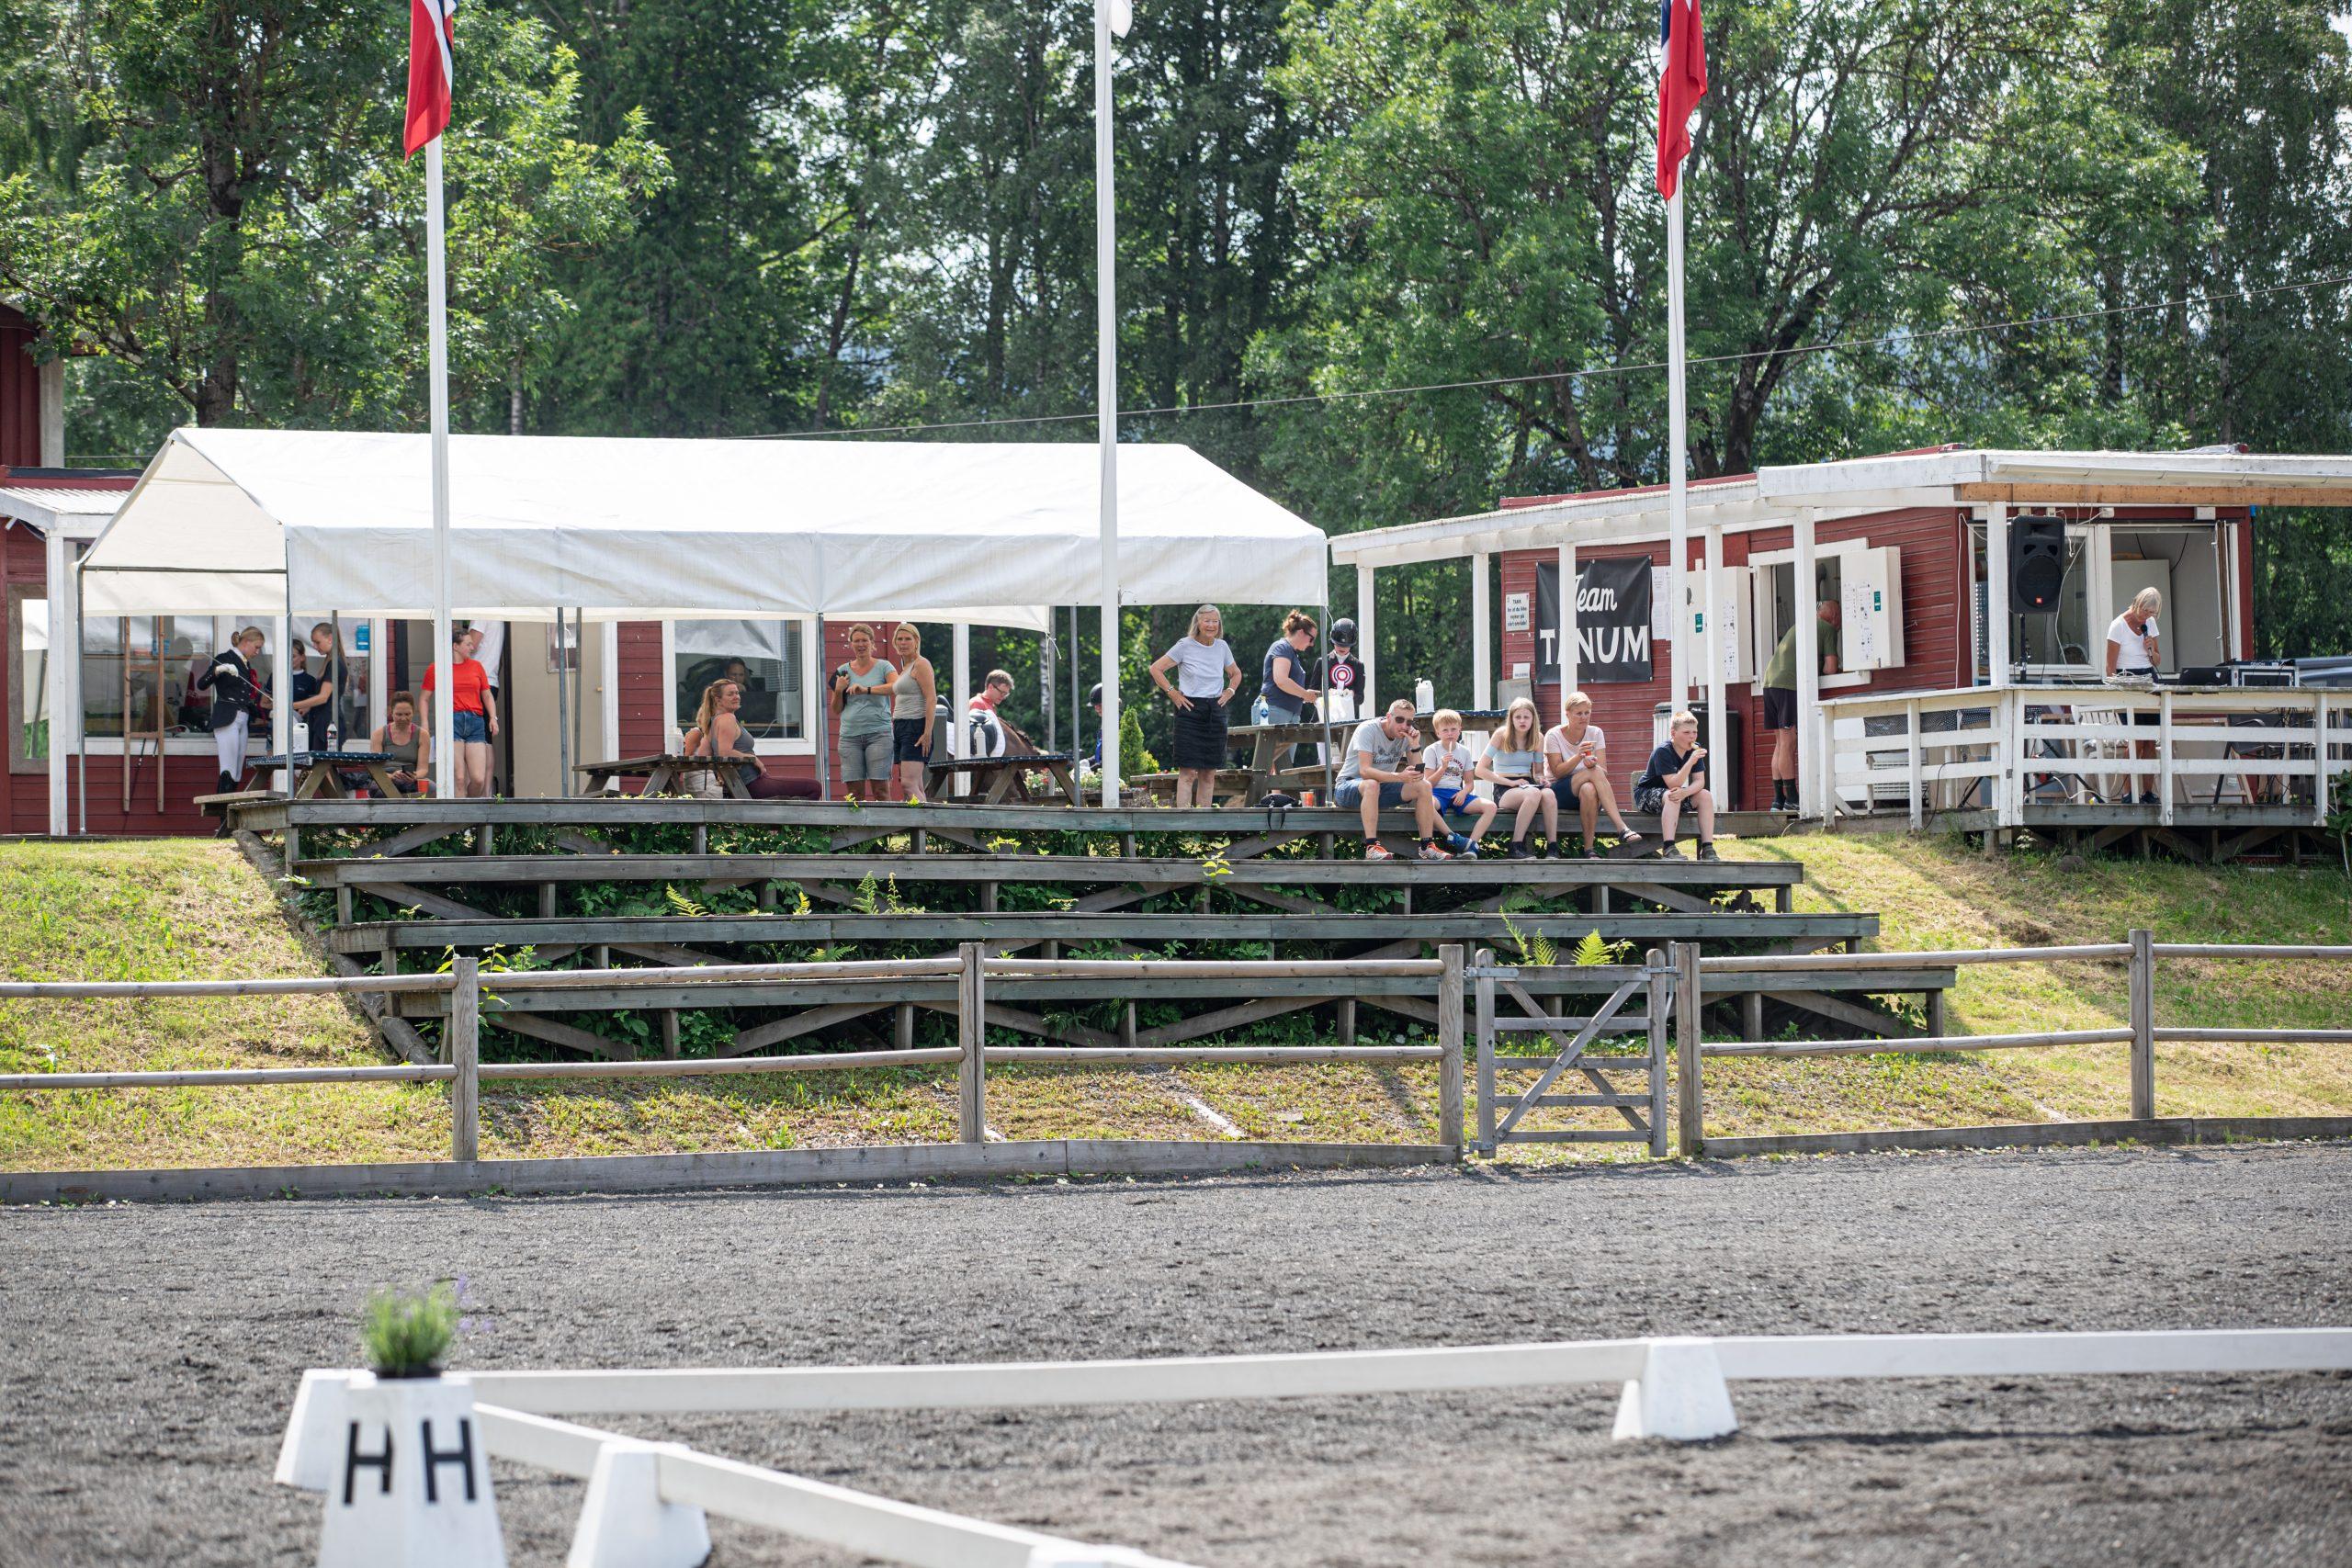 Tanum Rideklubb